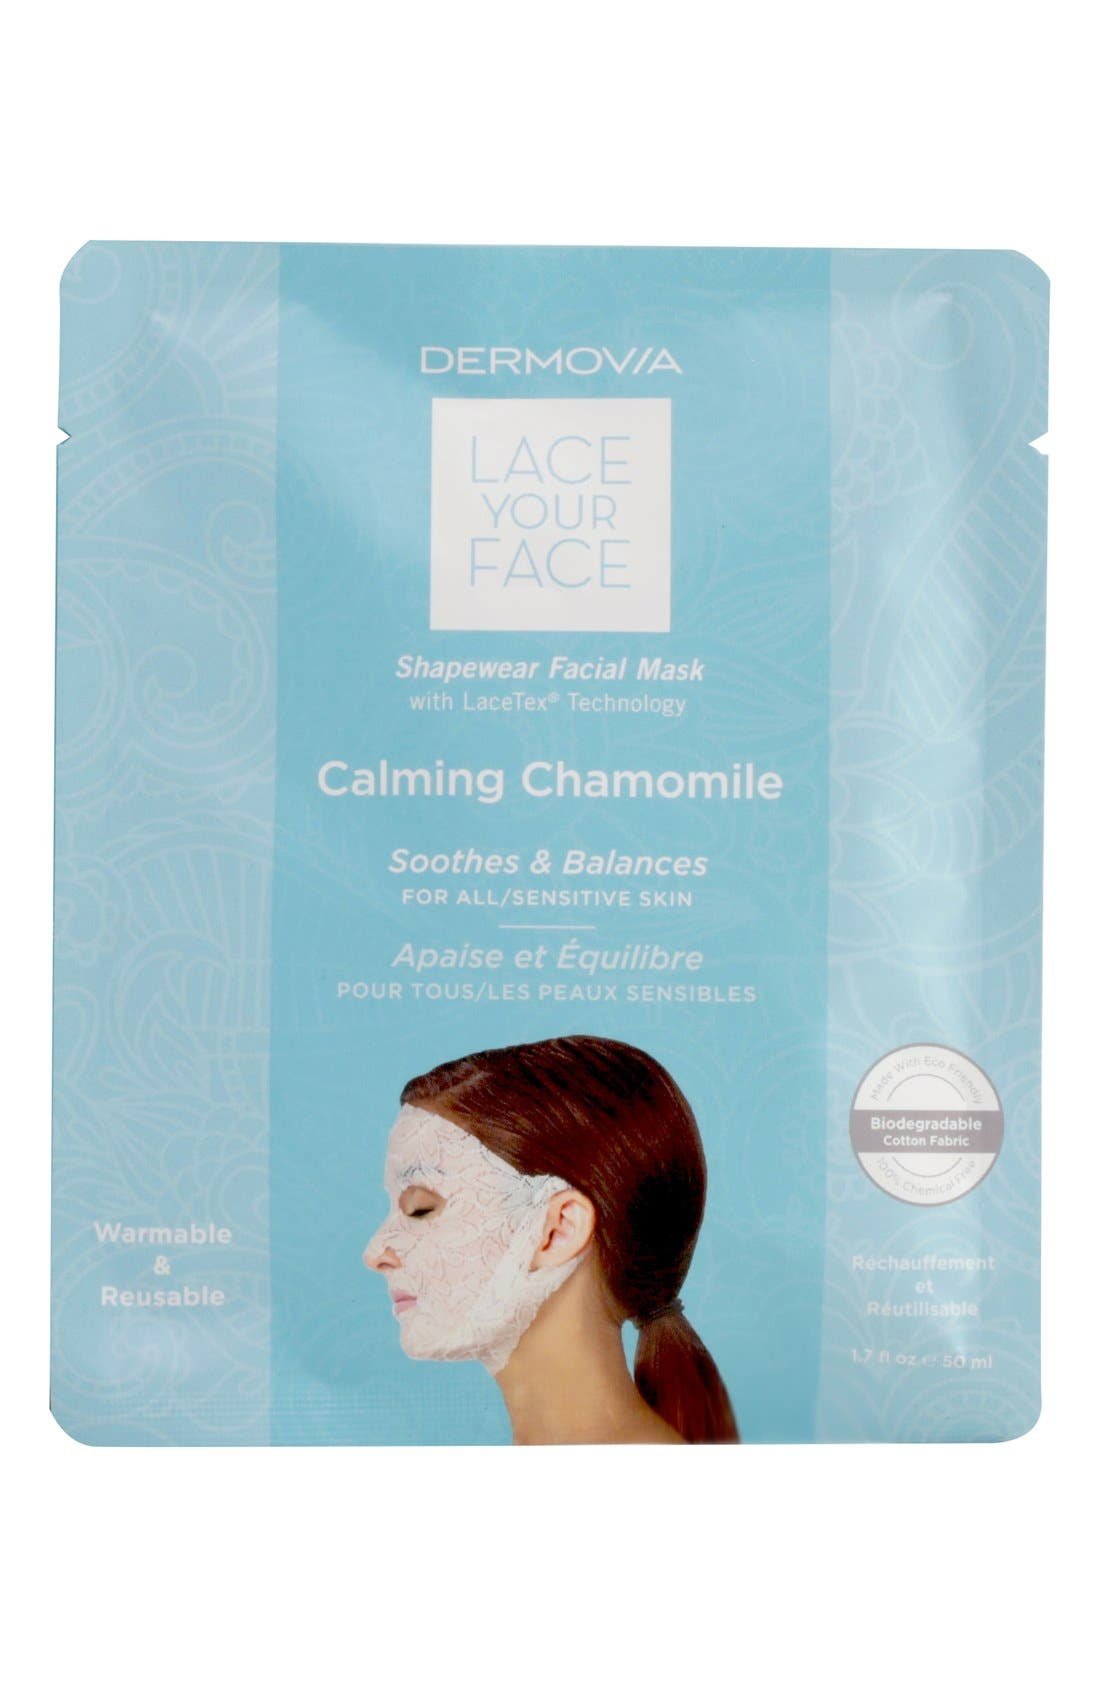 Dermovia Lace Your Face Chamomile Calming Compression Facial Mask